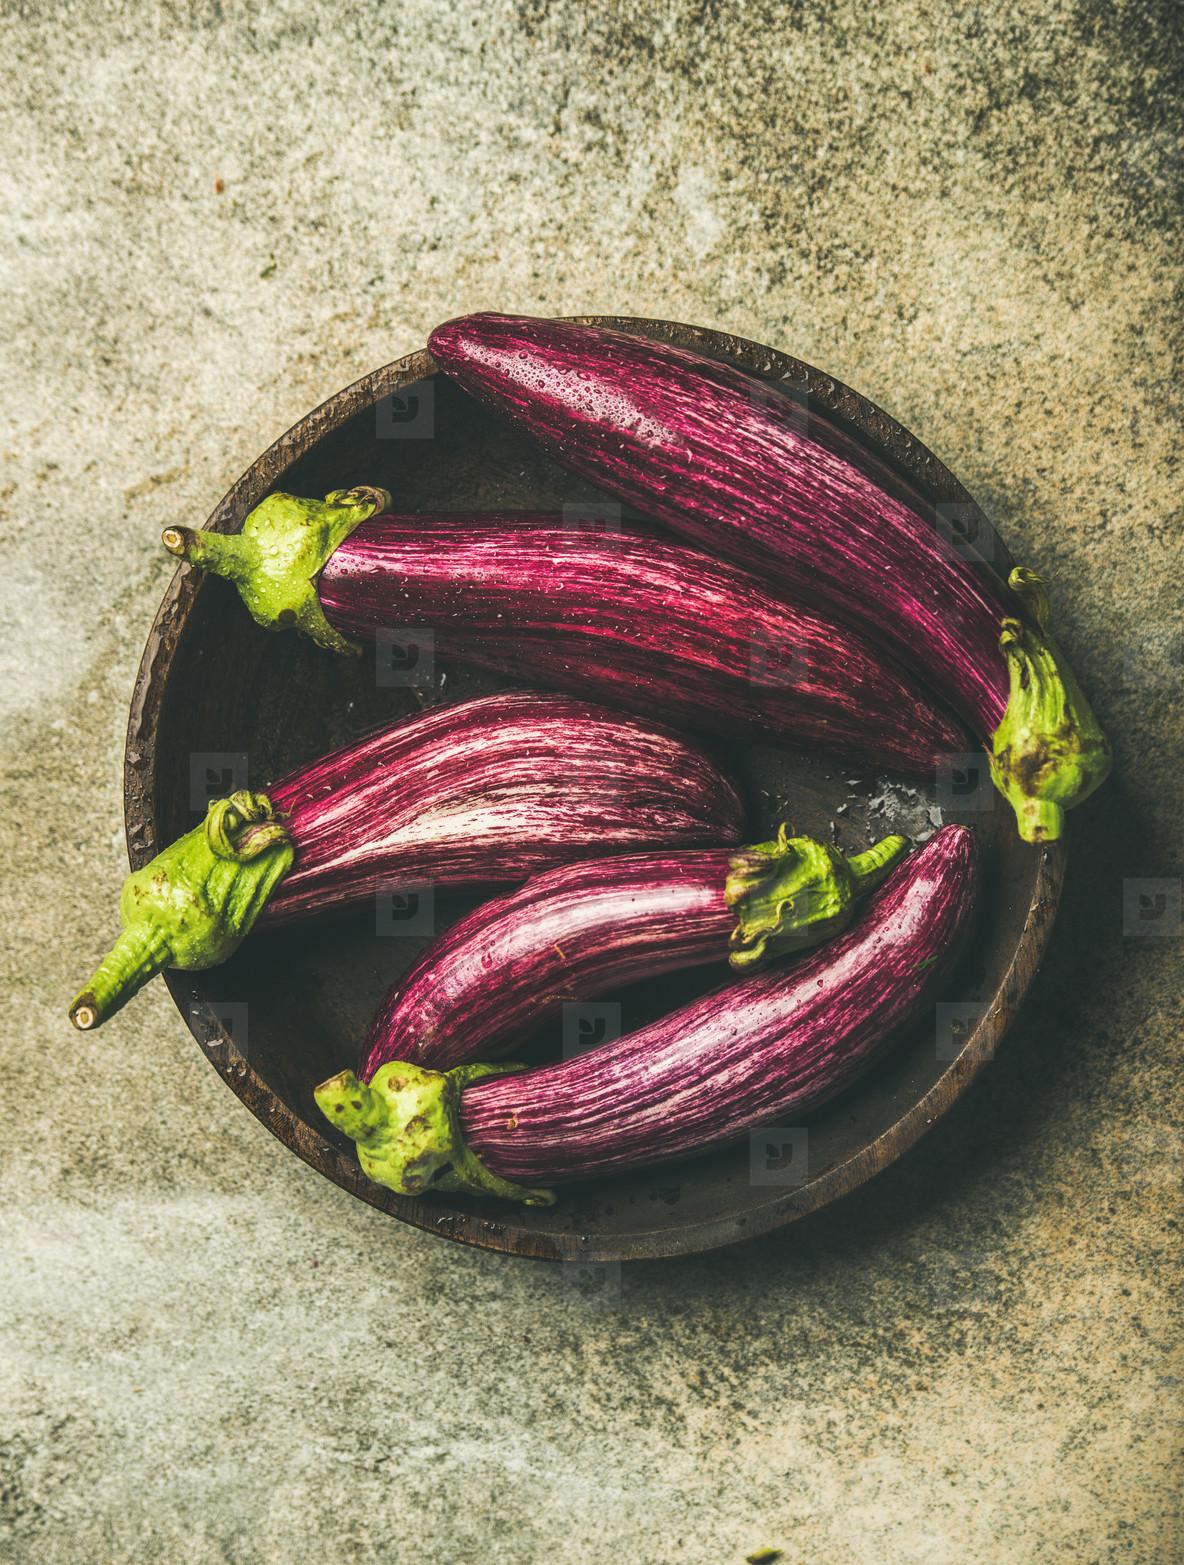 Flat lay of fresh raw Fall harvest purple eggplants or aubergines